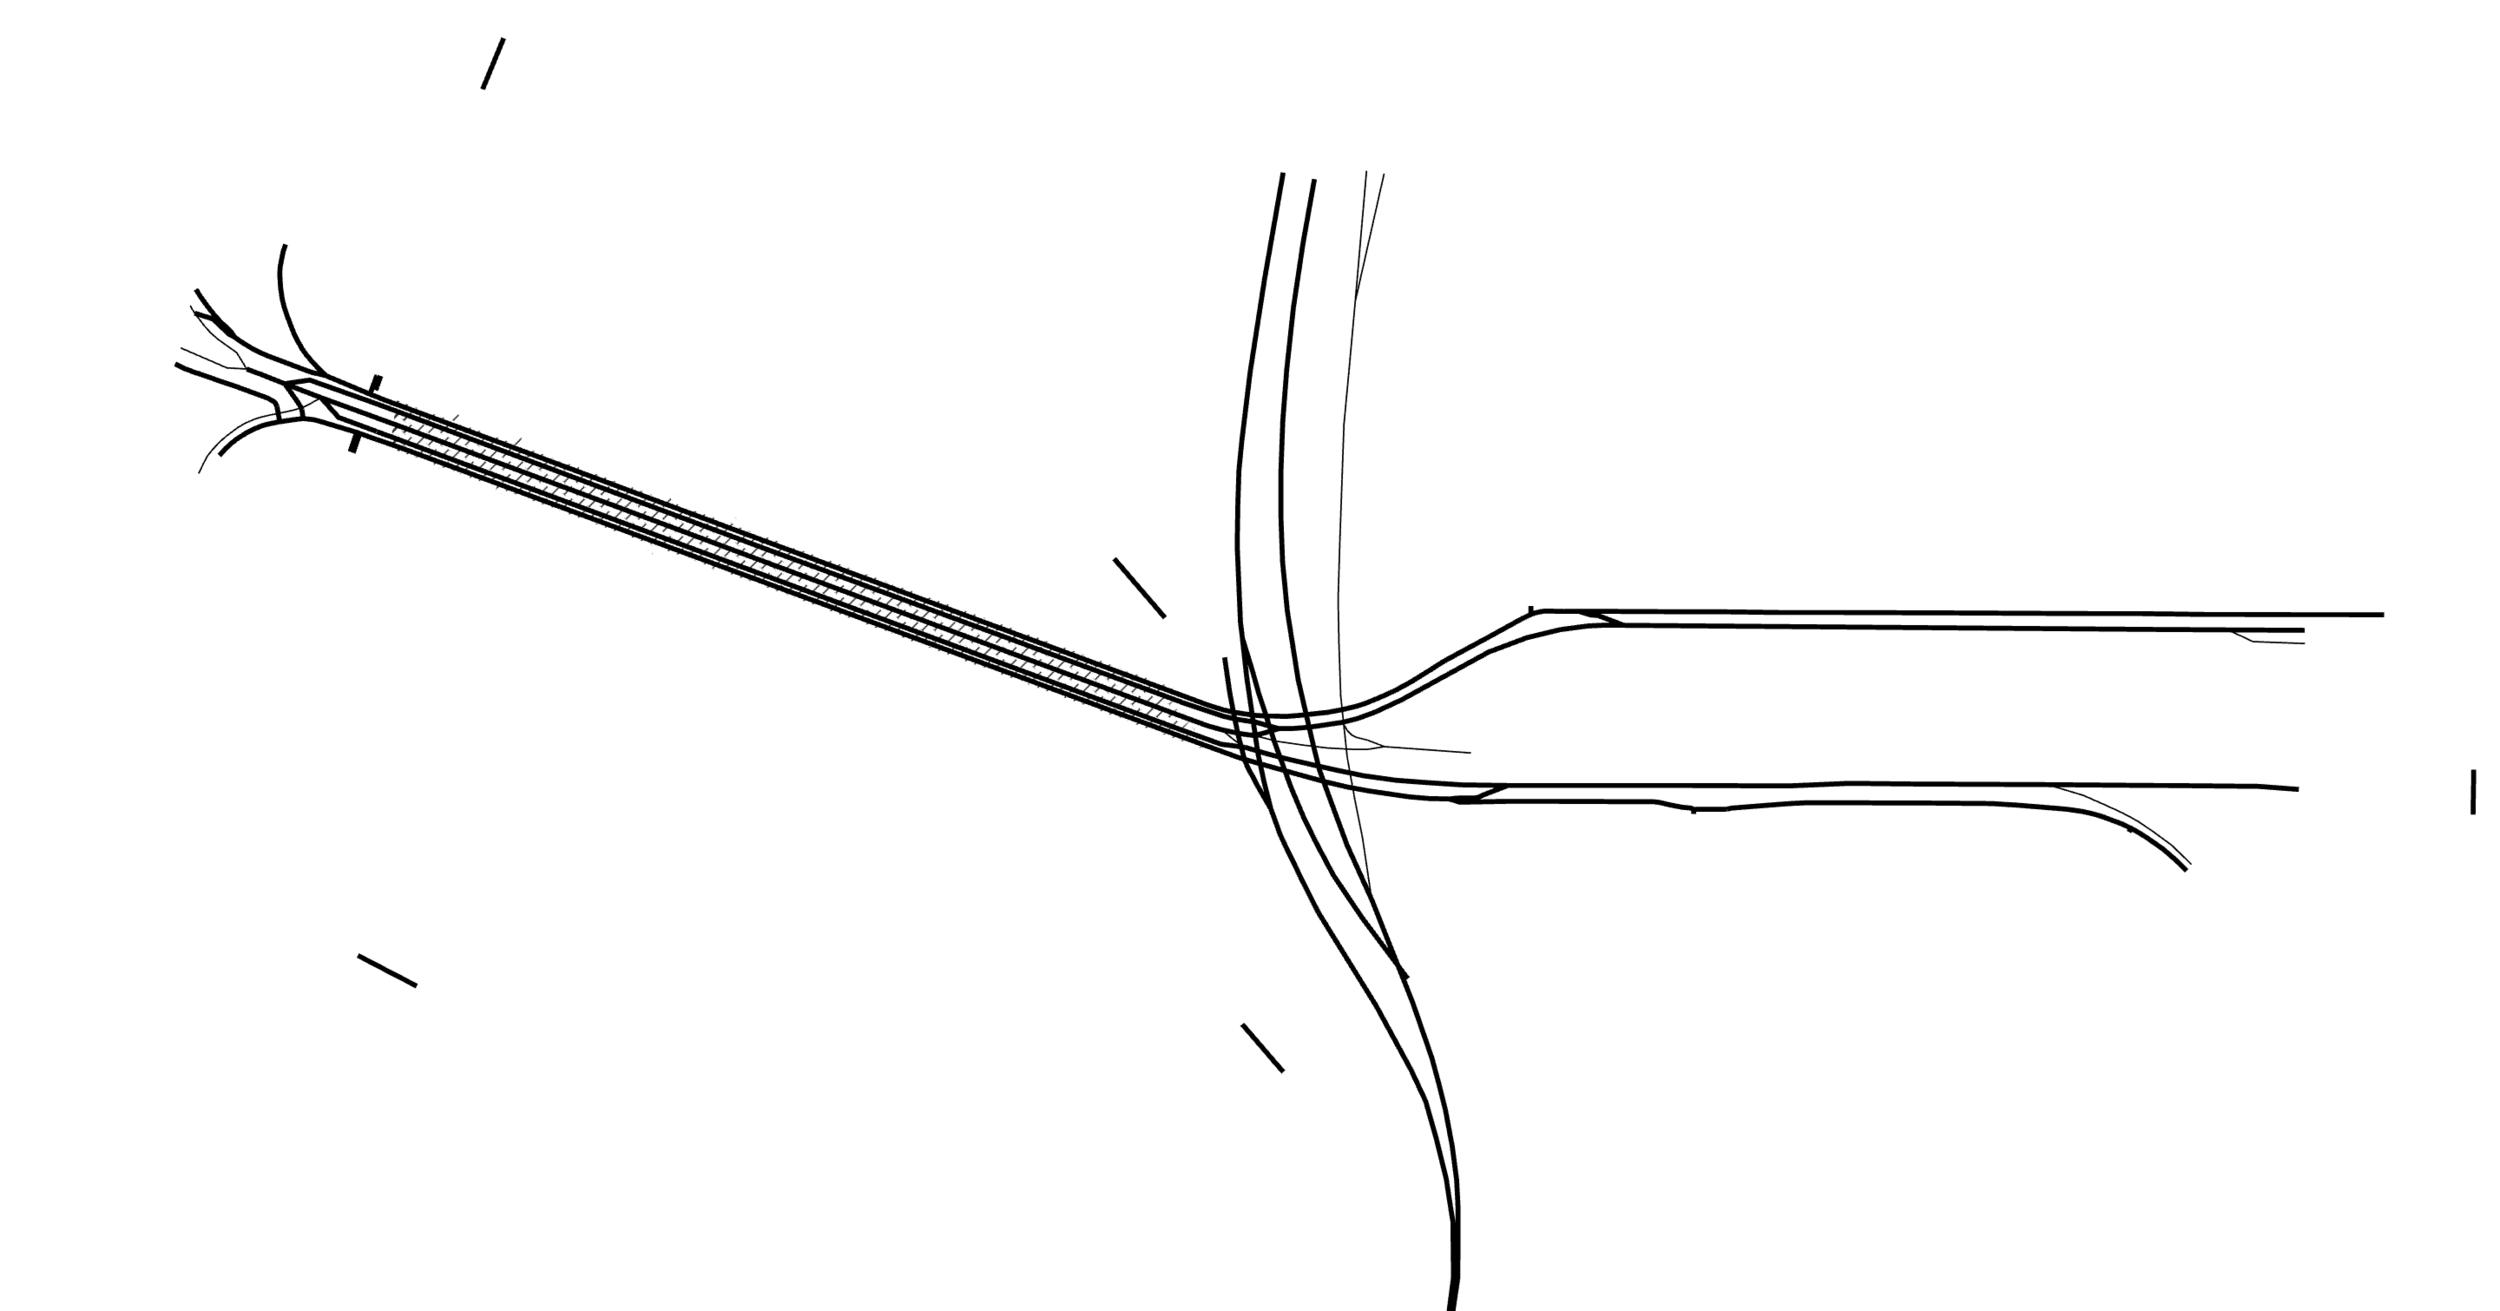 https://sensescape.github.io/morphology/#11%25252525252525252F45.5056%25252525252525252F-73.5734=&z=17&lat=45.51282&lng=-122.66794&form=bridges